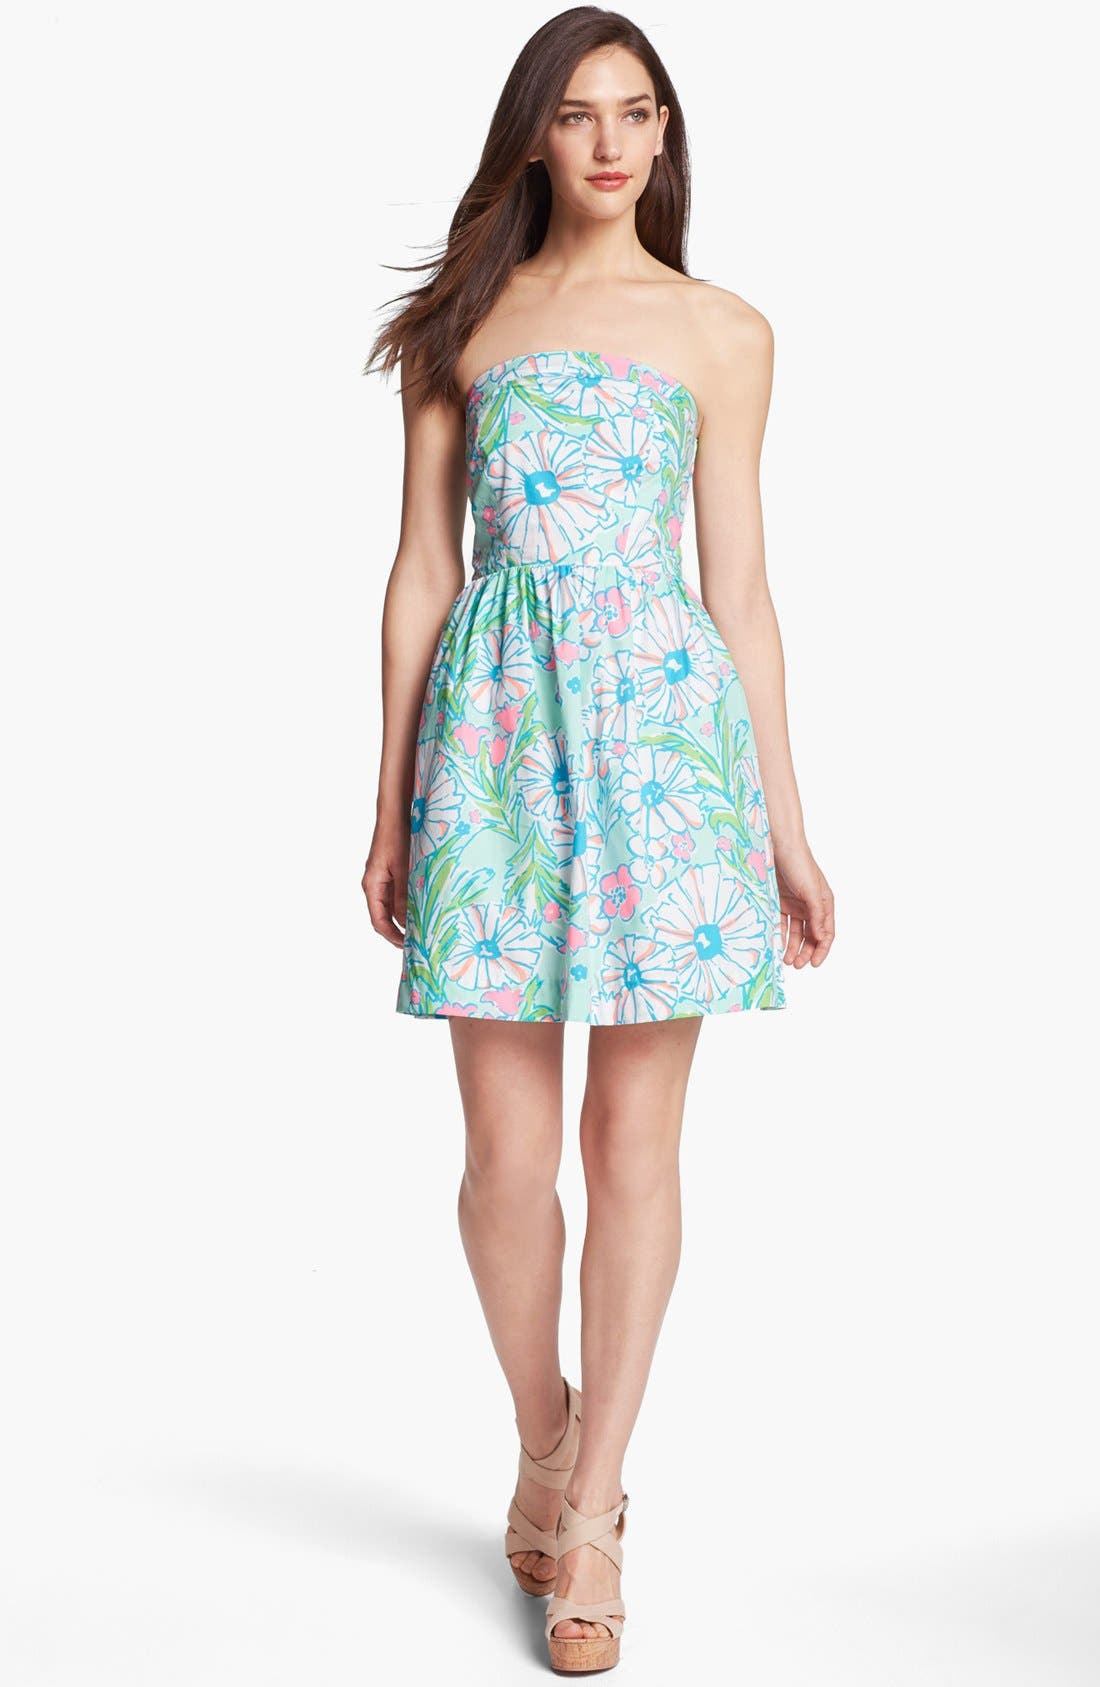 Main Image - Lilly Pulitzer® 'Chandie' Strapless Dress